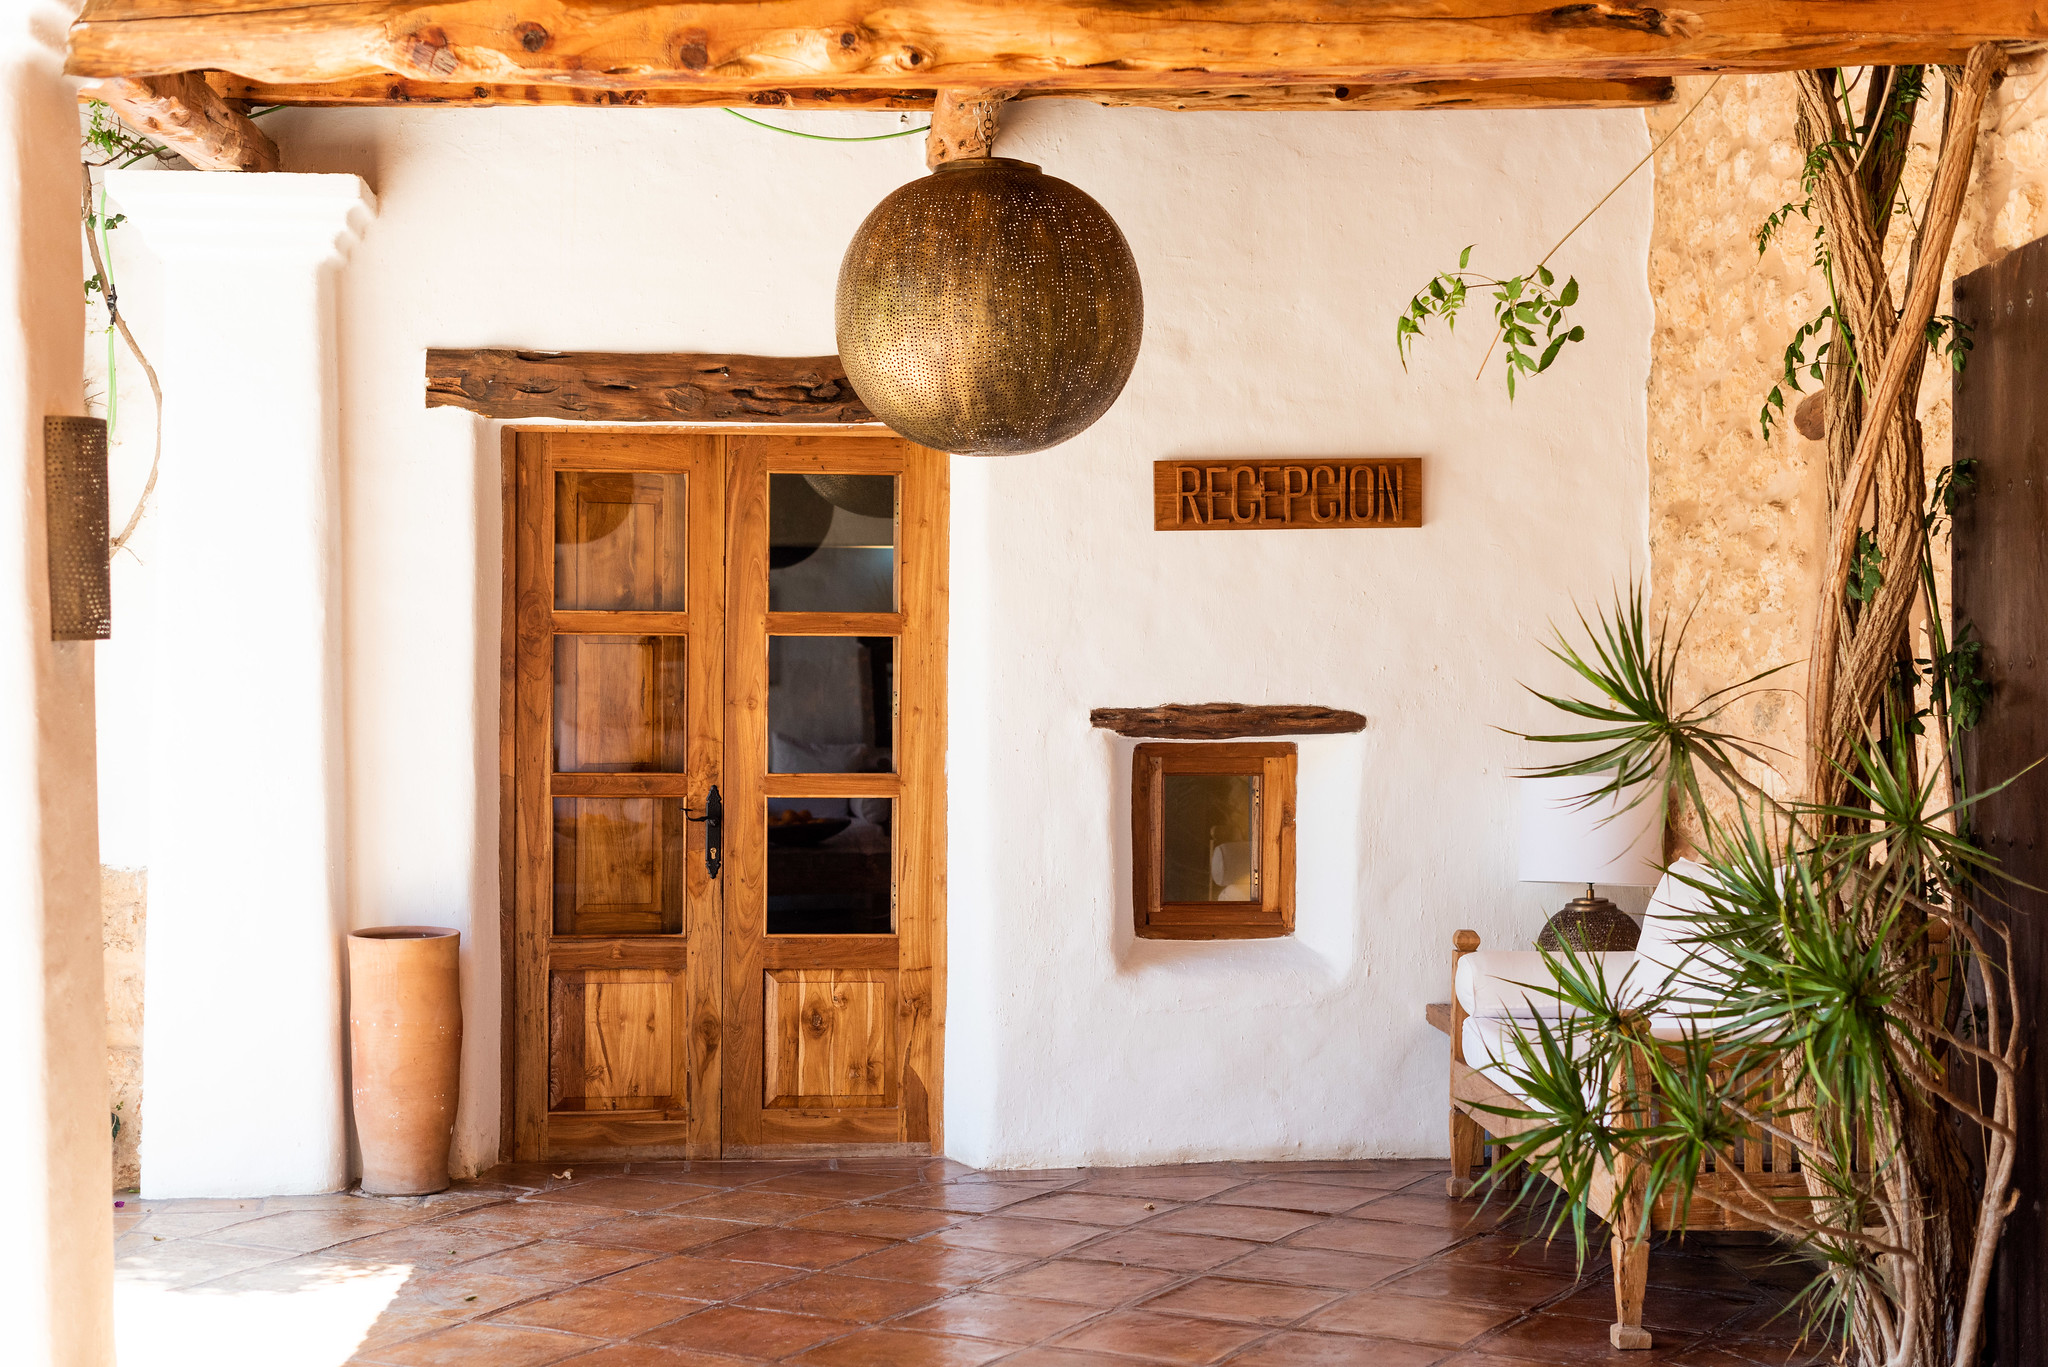 https://www.white-ibiza.com/wp-content/uploads/2019/11/ibiza-hotels-agoturismos-agroturismo-atzaro-05.jpg